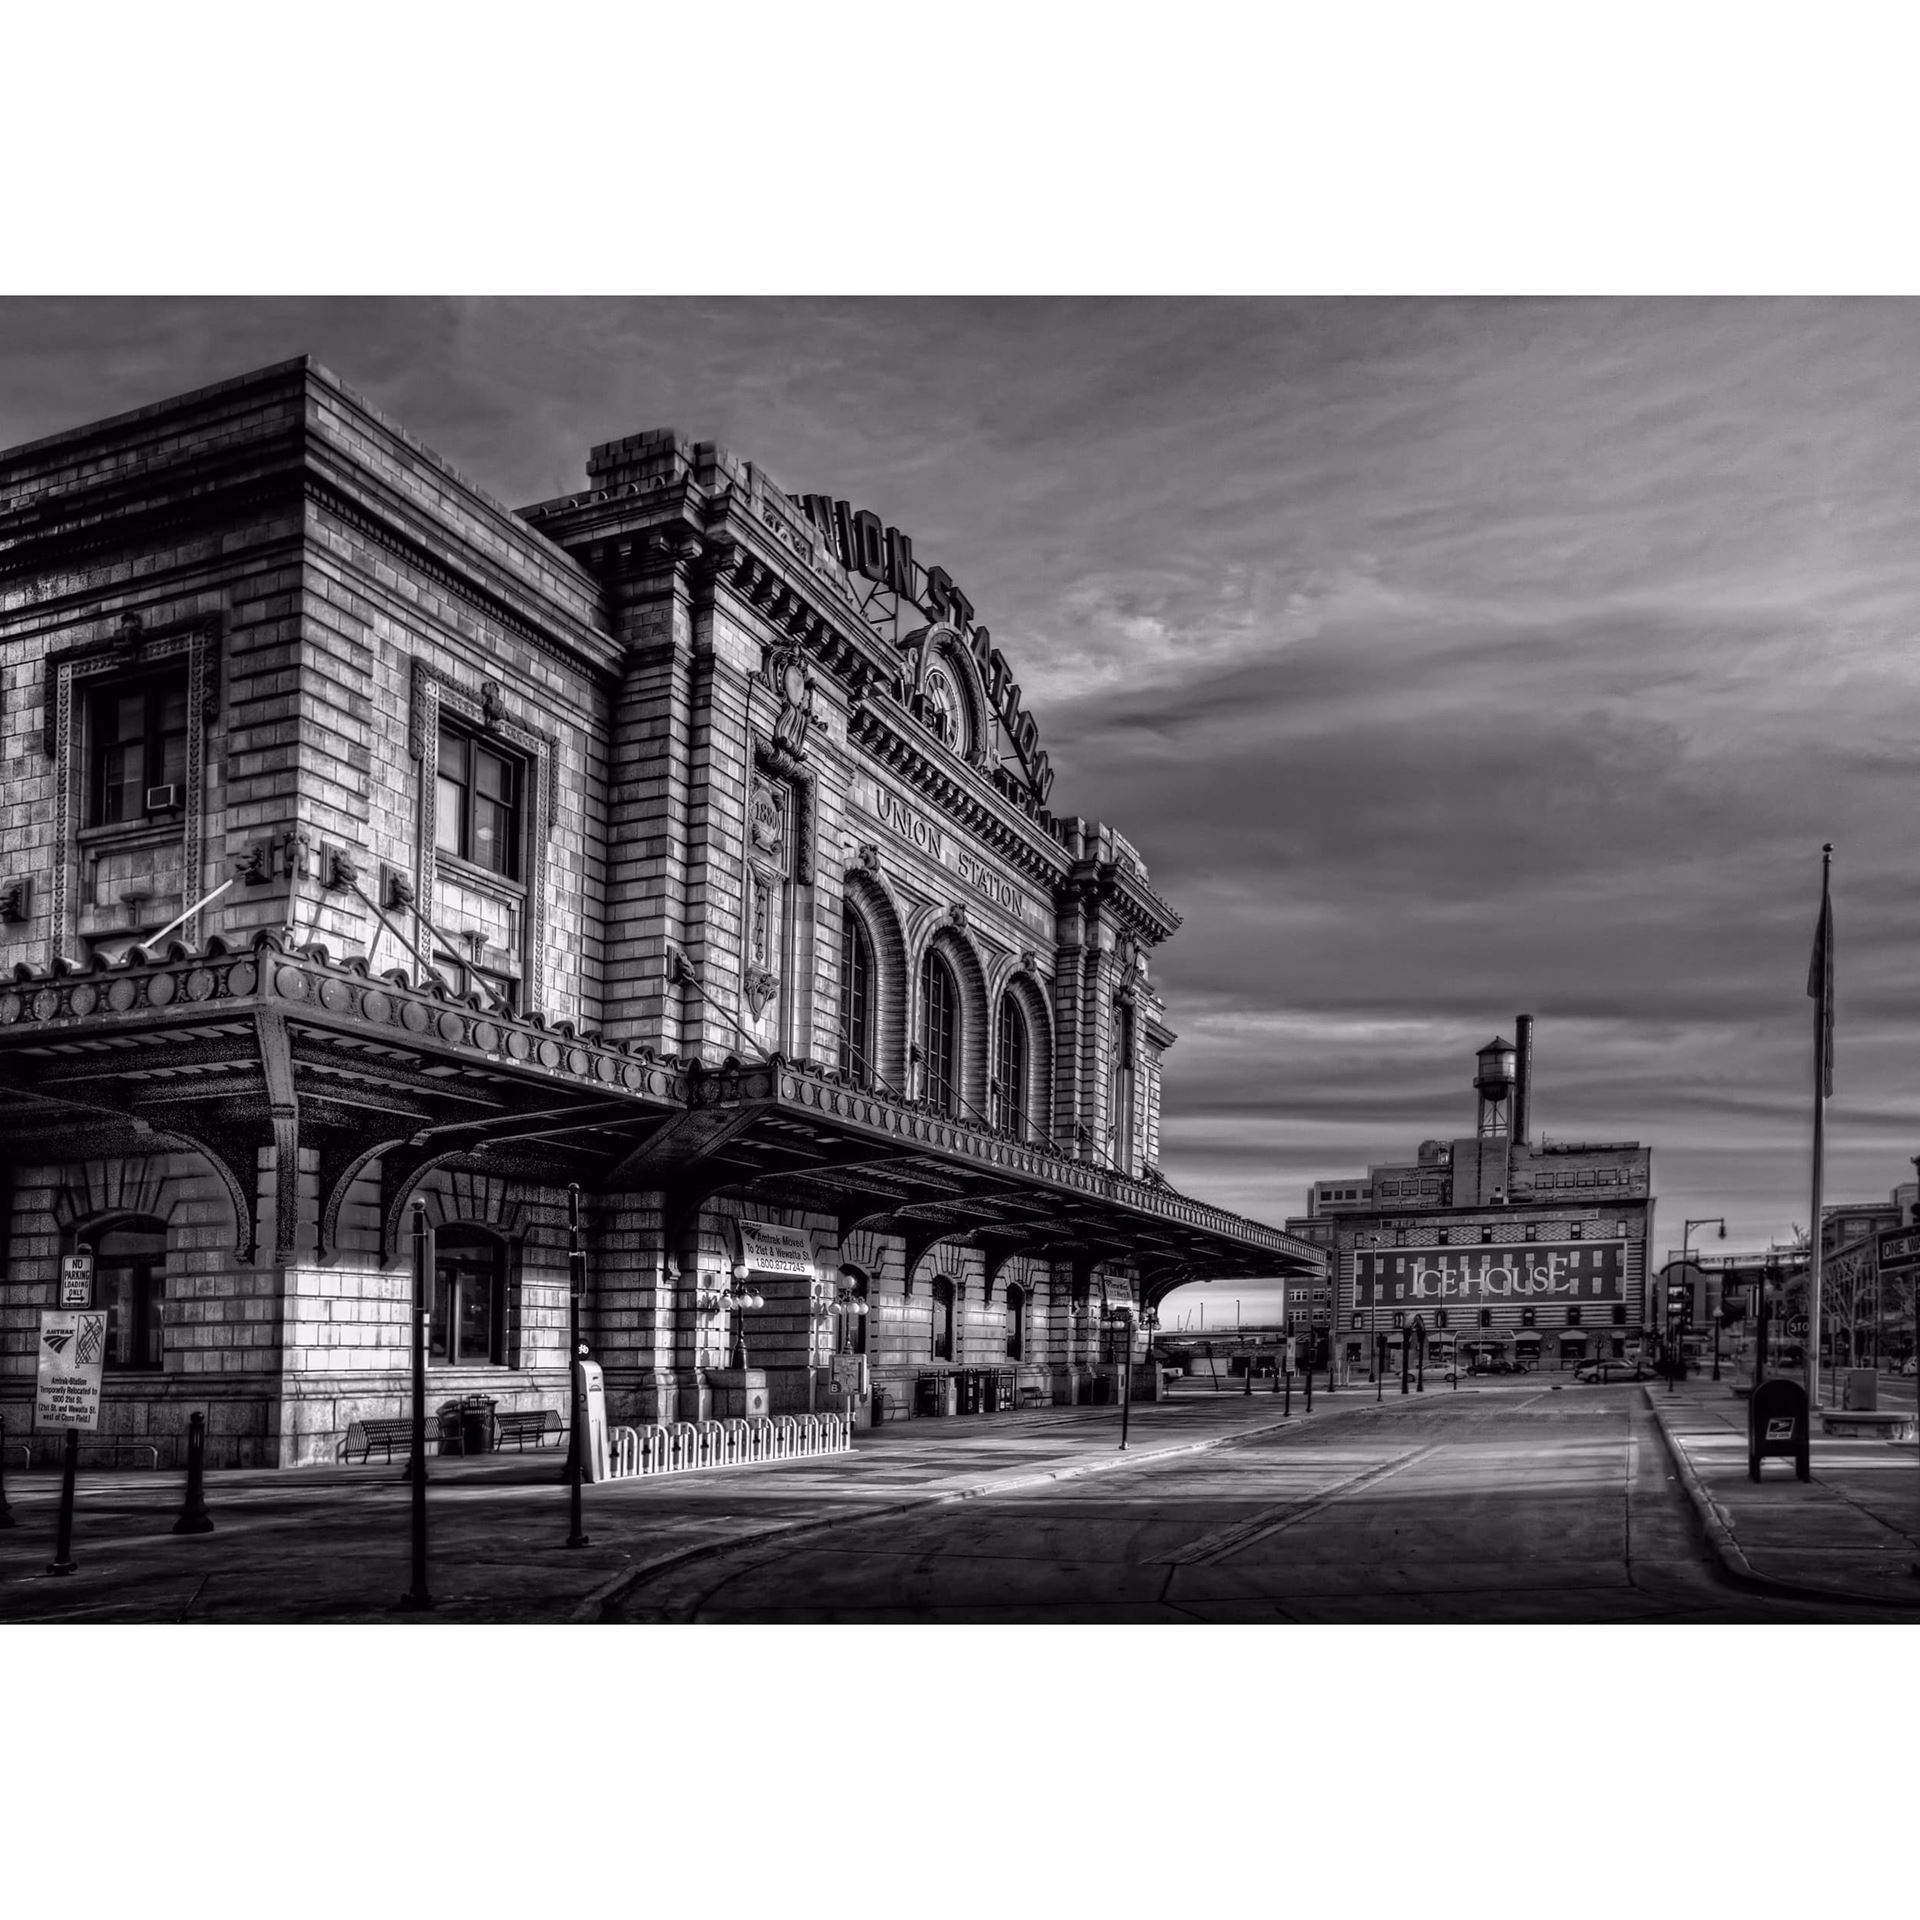 Union Station BW 36x24